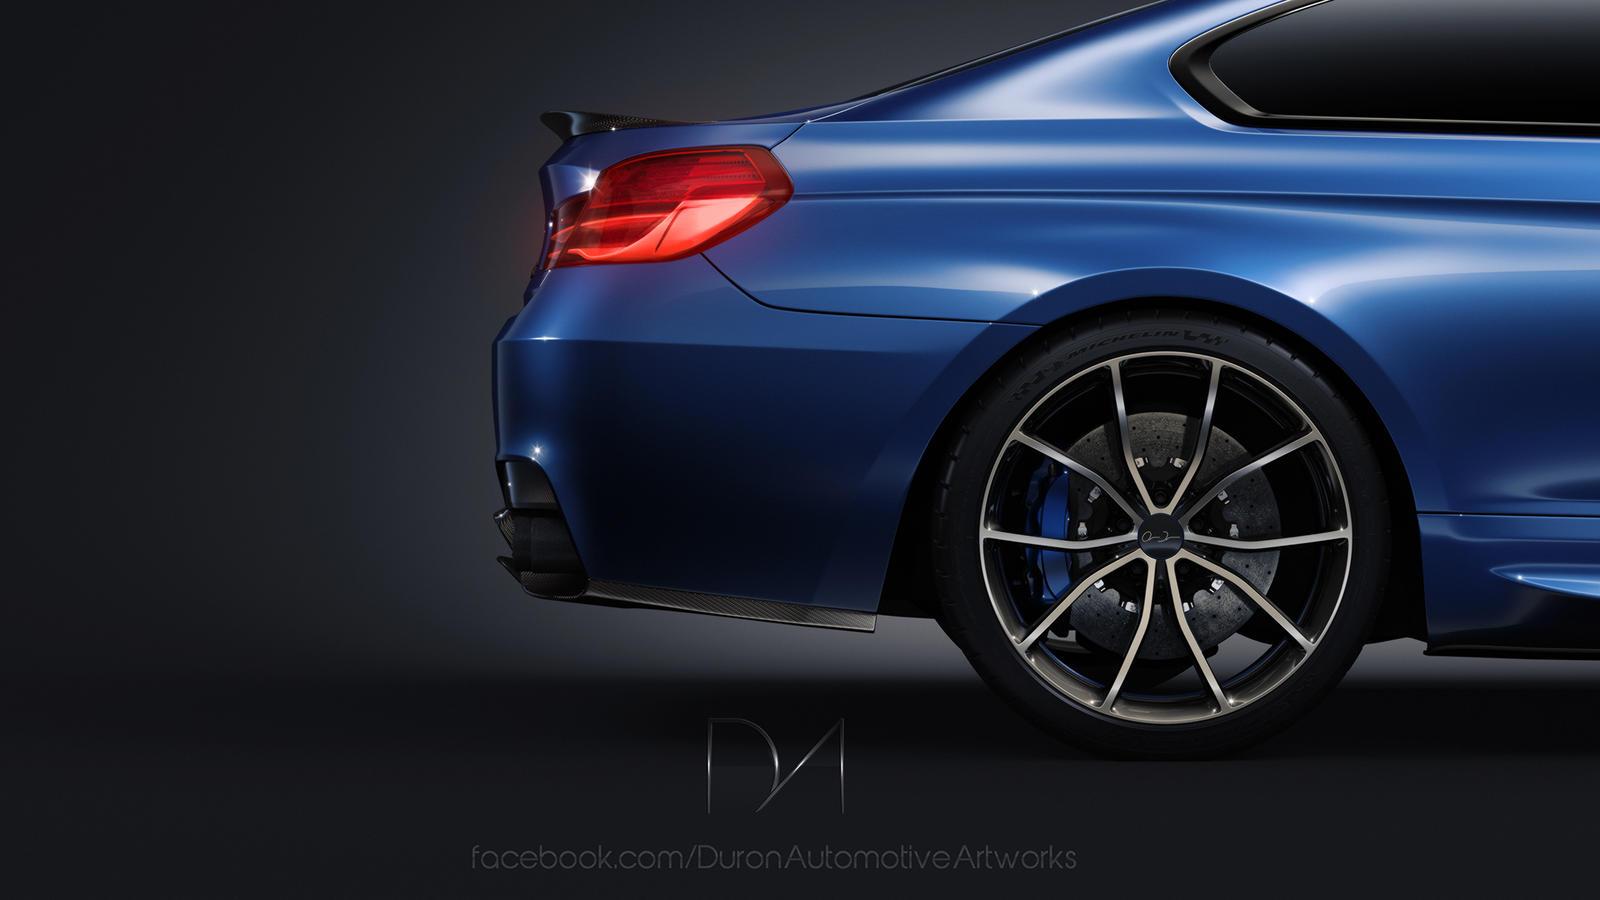 DA M6 F13 | Studio teaser by DuronDesign